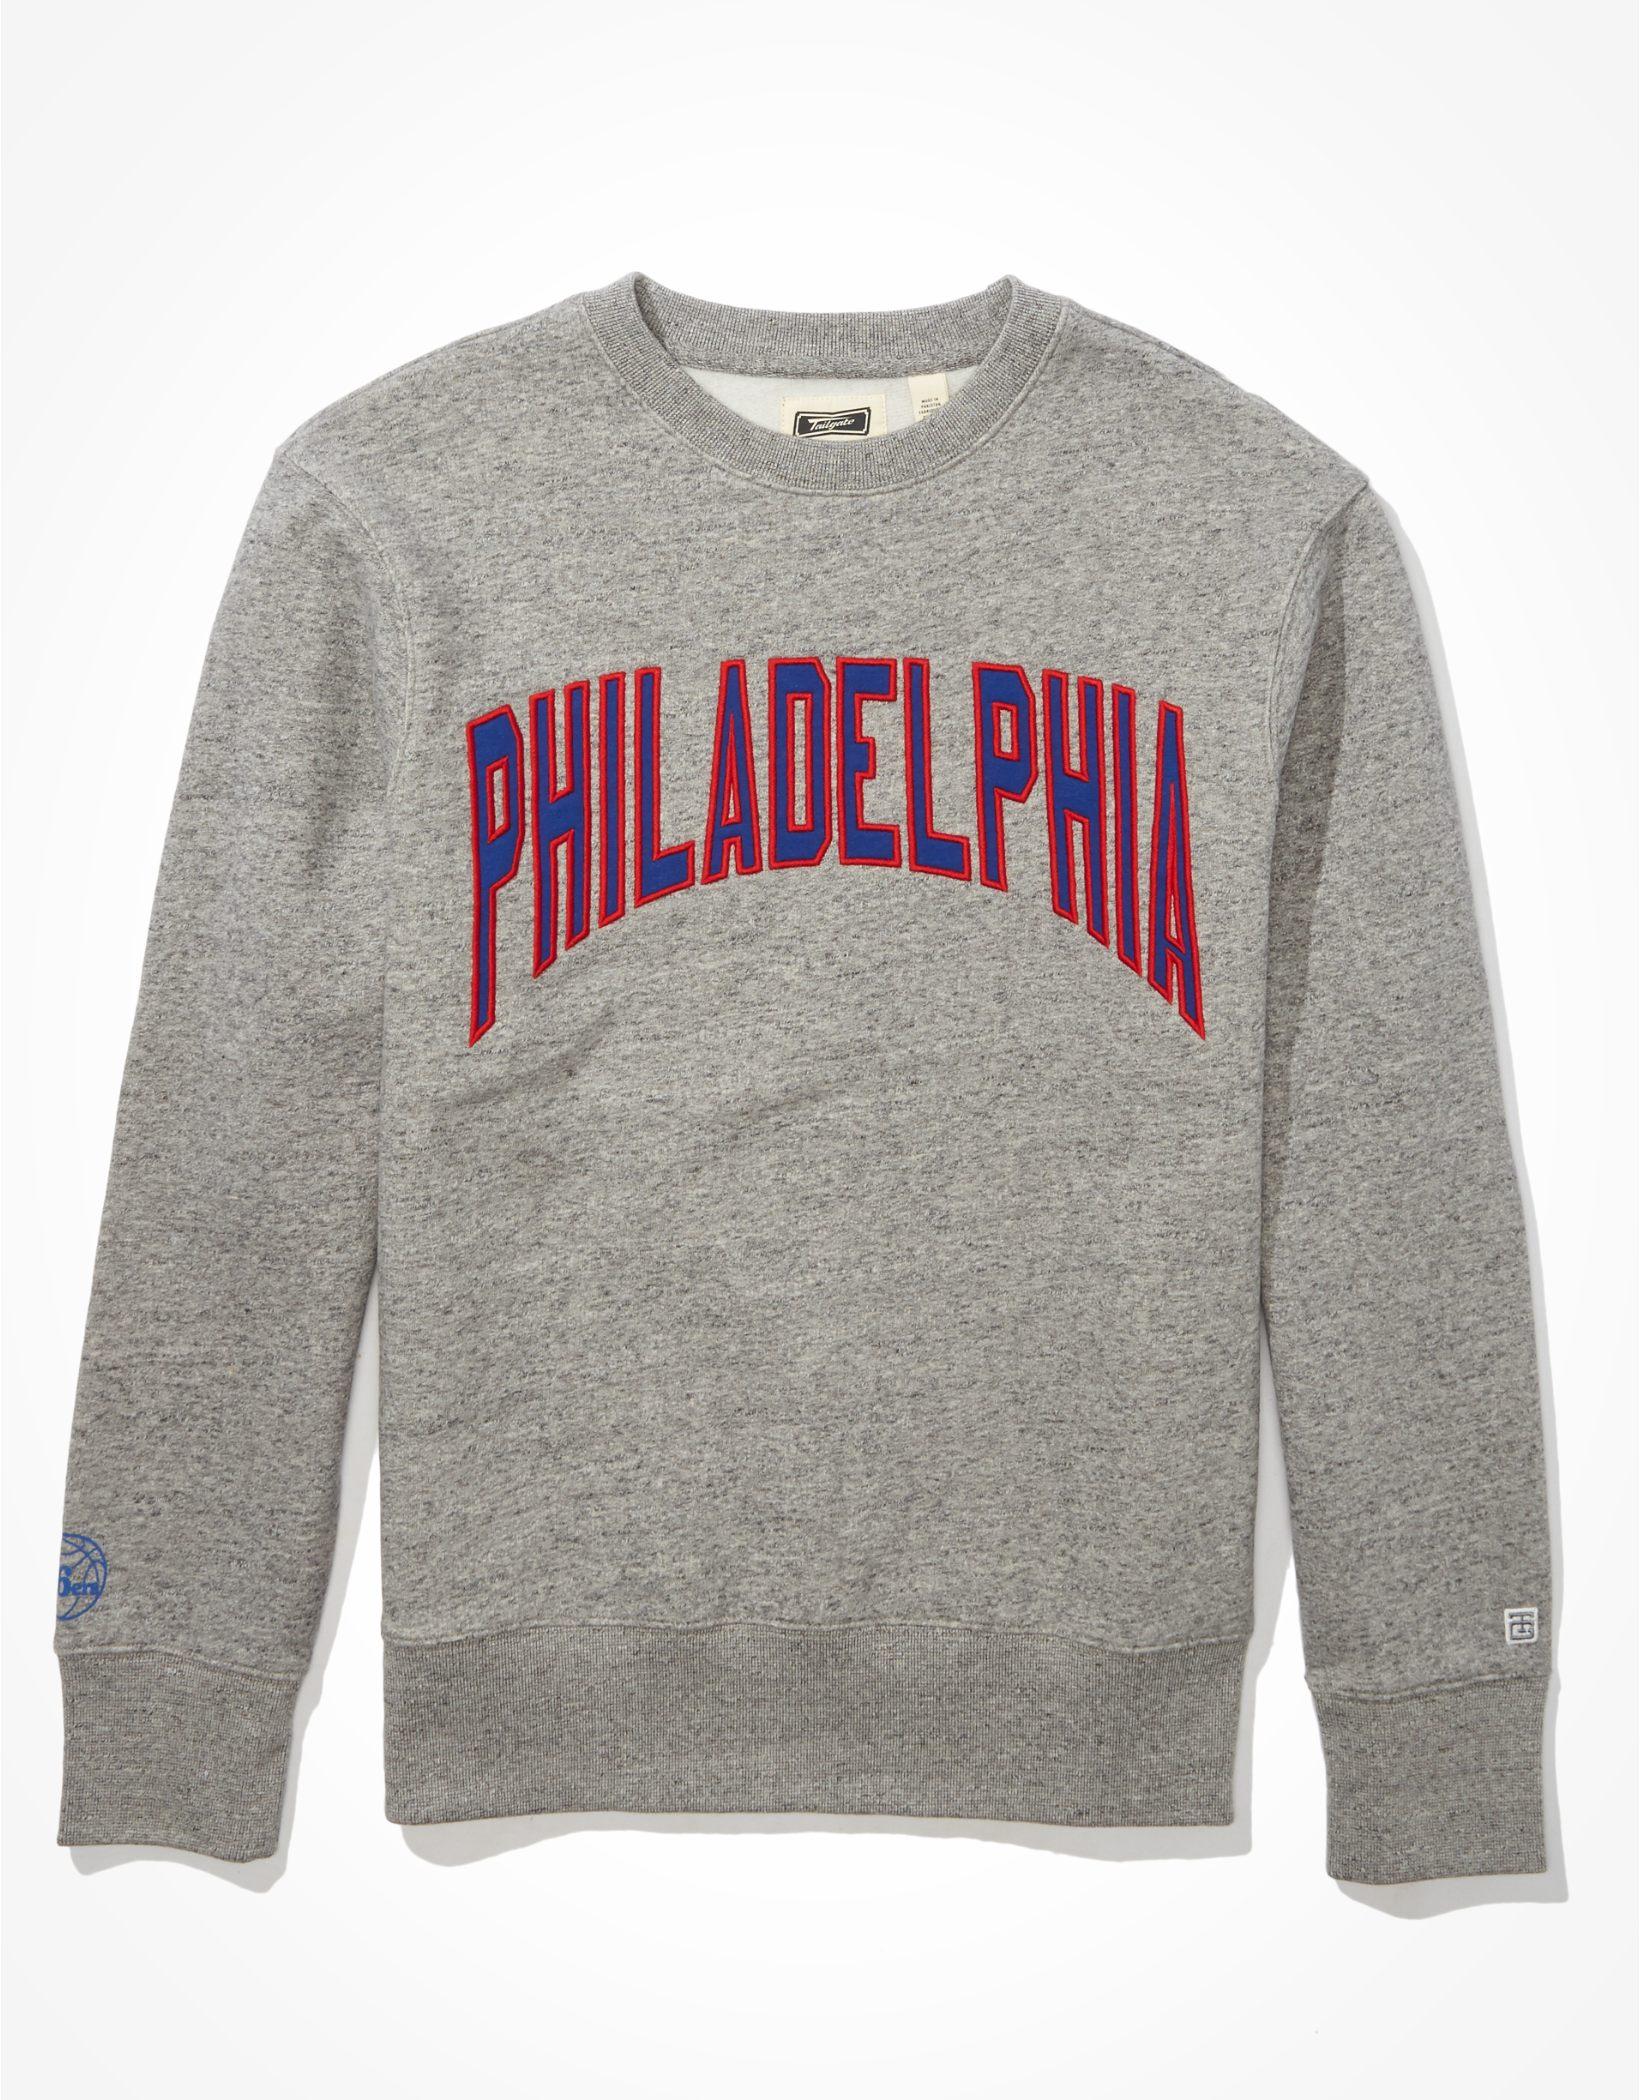 Tailgate Men's Philadelphia 76ers Fleece Sweatshirt